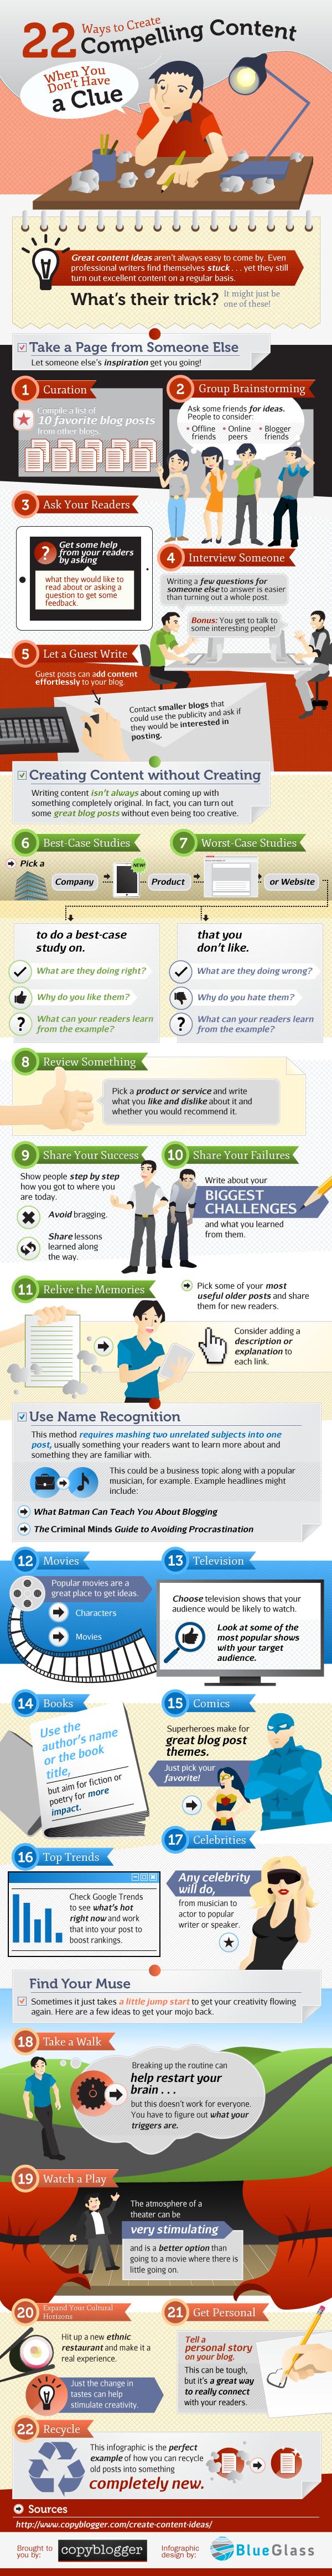 copyblogger_infographic_1